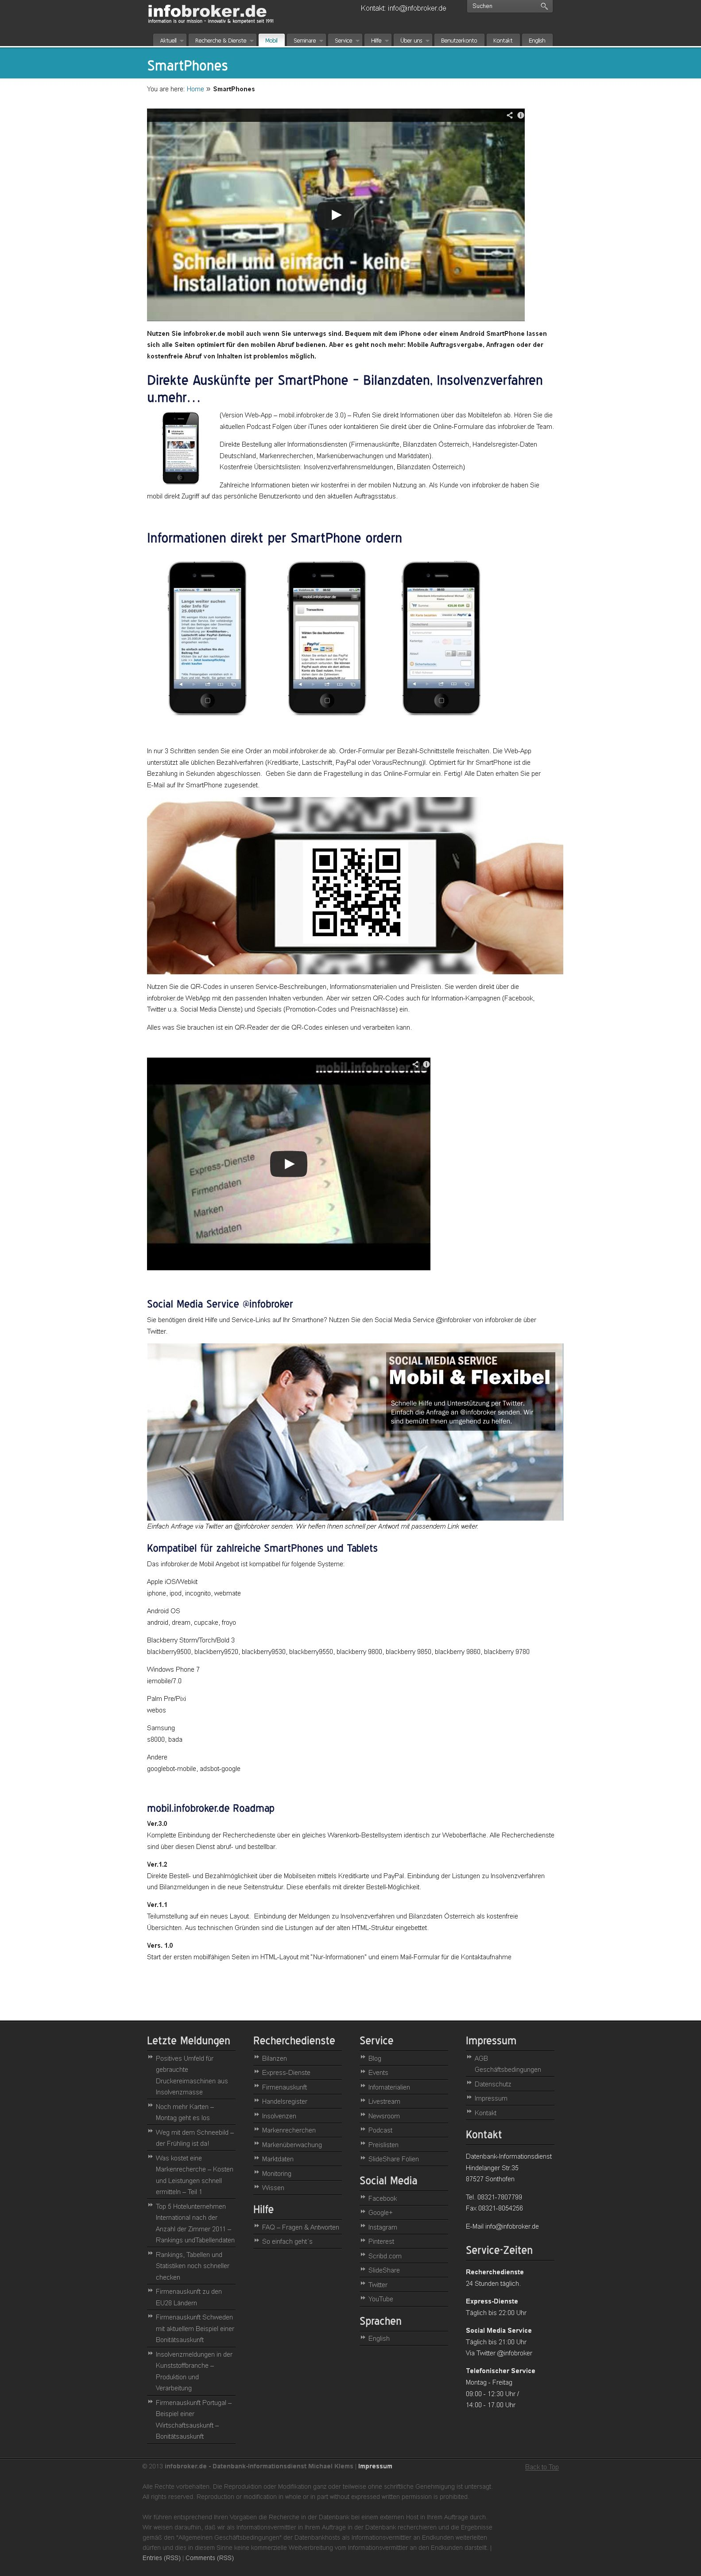 infobroker.de WebApp - Recherchedienste mobil per SmartPhone oder Tablet nutzen. Unsere Info-Seite als ScreenShot.